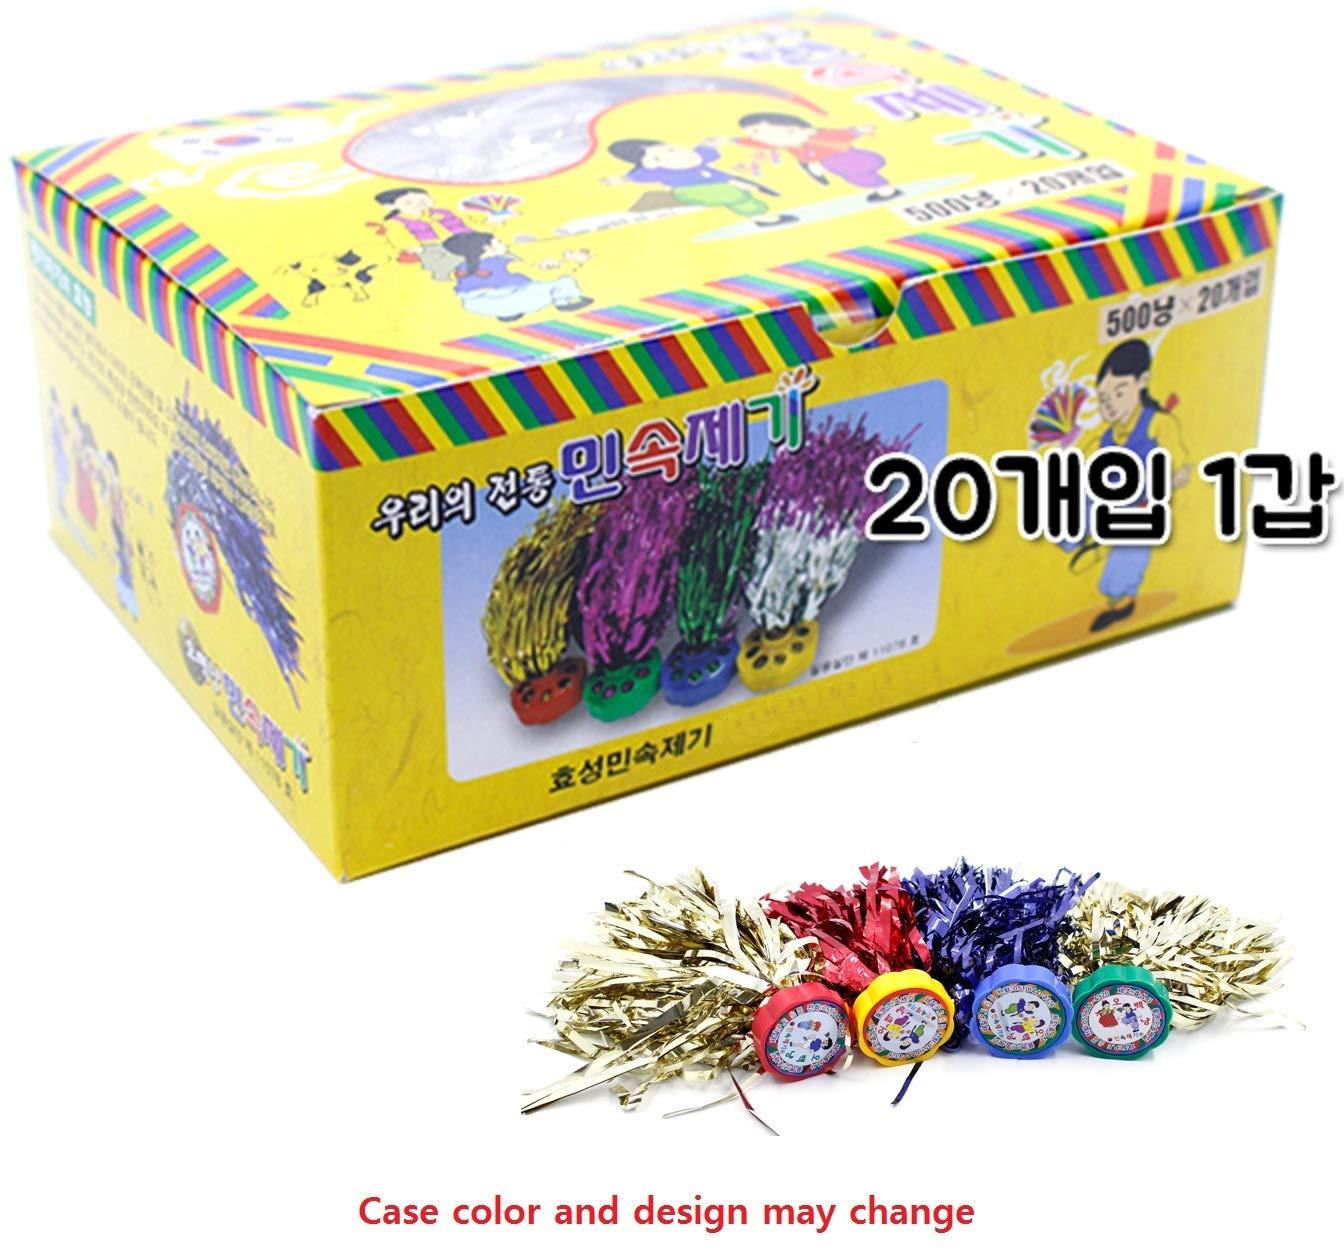 Hyosungsa Korean Folk Play Traditional Footbag Game Jegi Chagi 1 Box / 20pcs Small Size Random Color